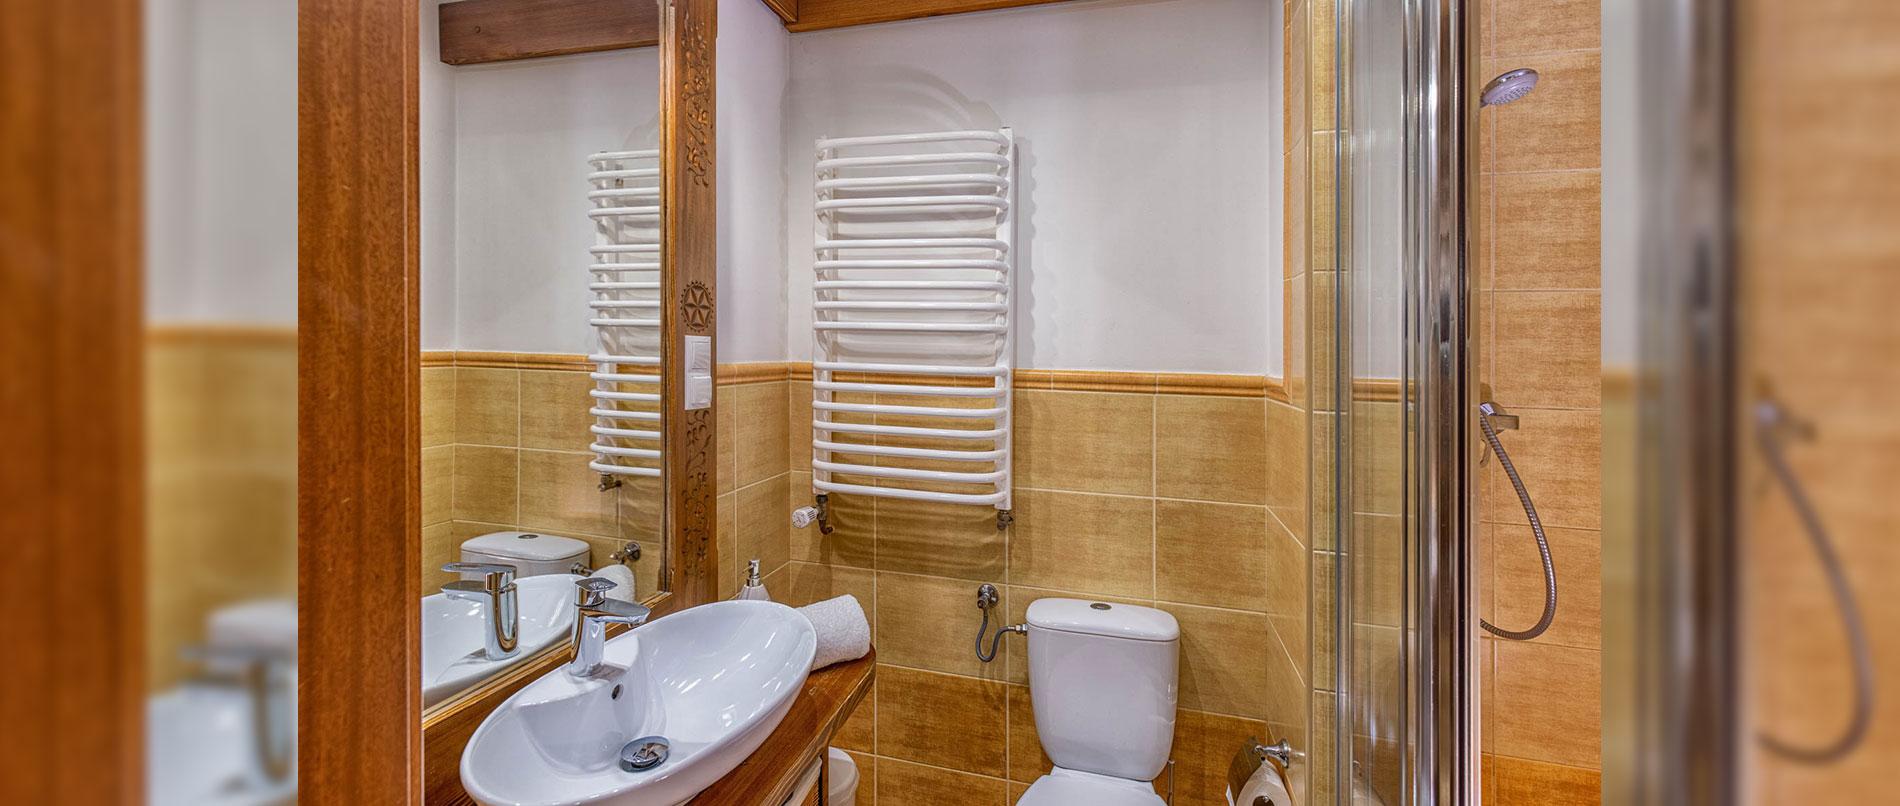 Apartament Premium 4 - łazienka